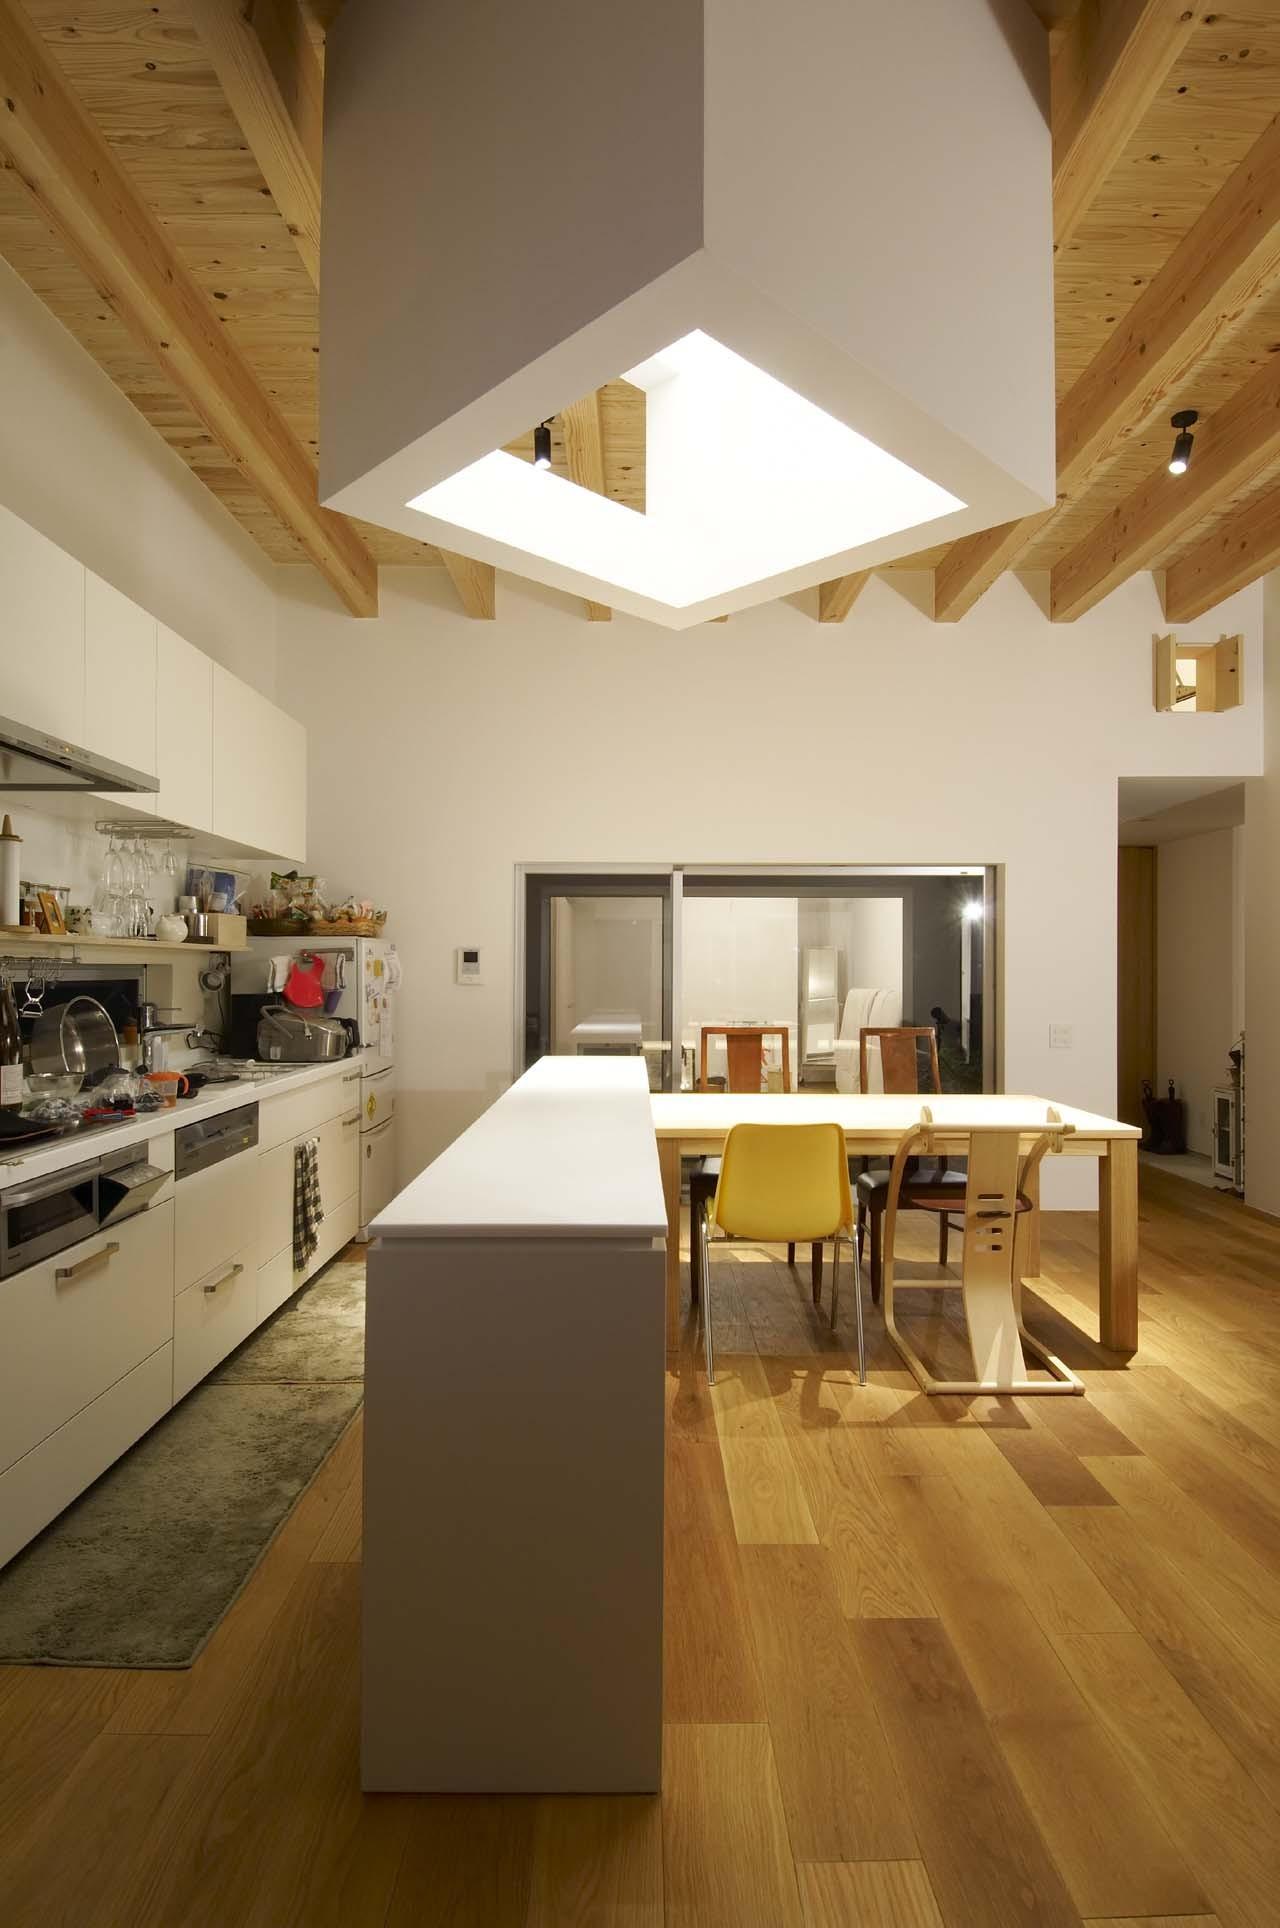 Single Family House / ninkipen!, © Hiroki Kawata